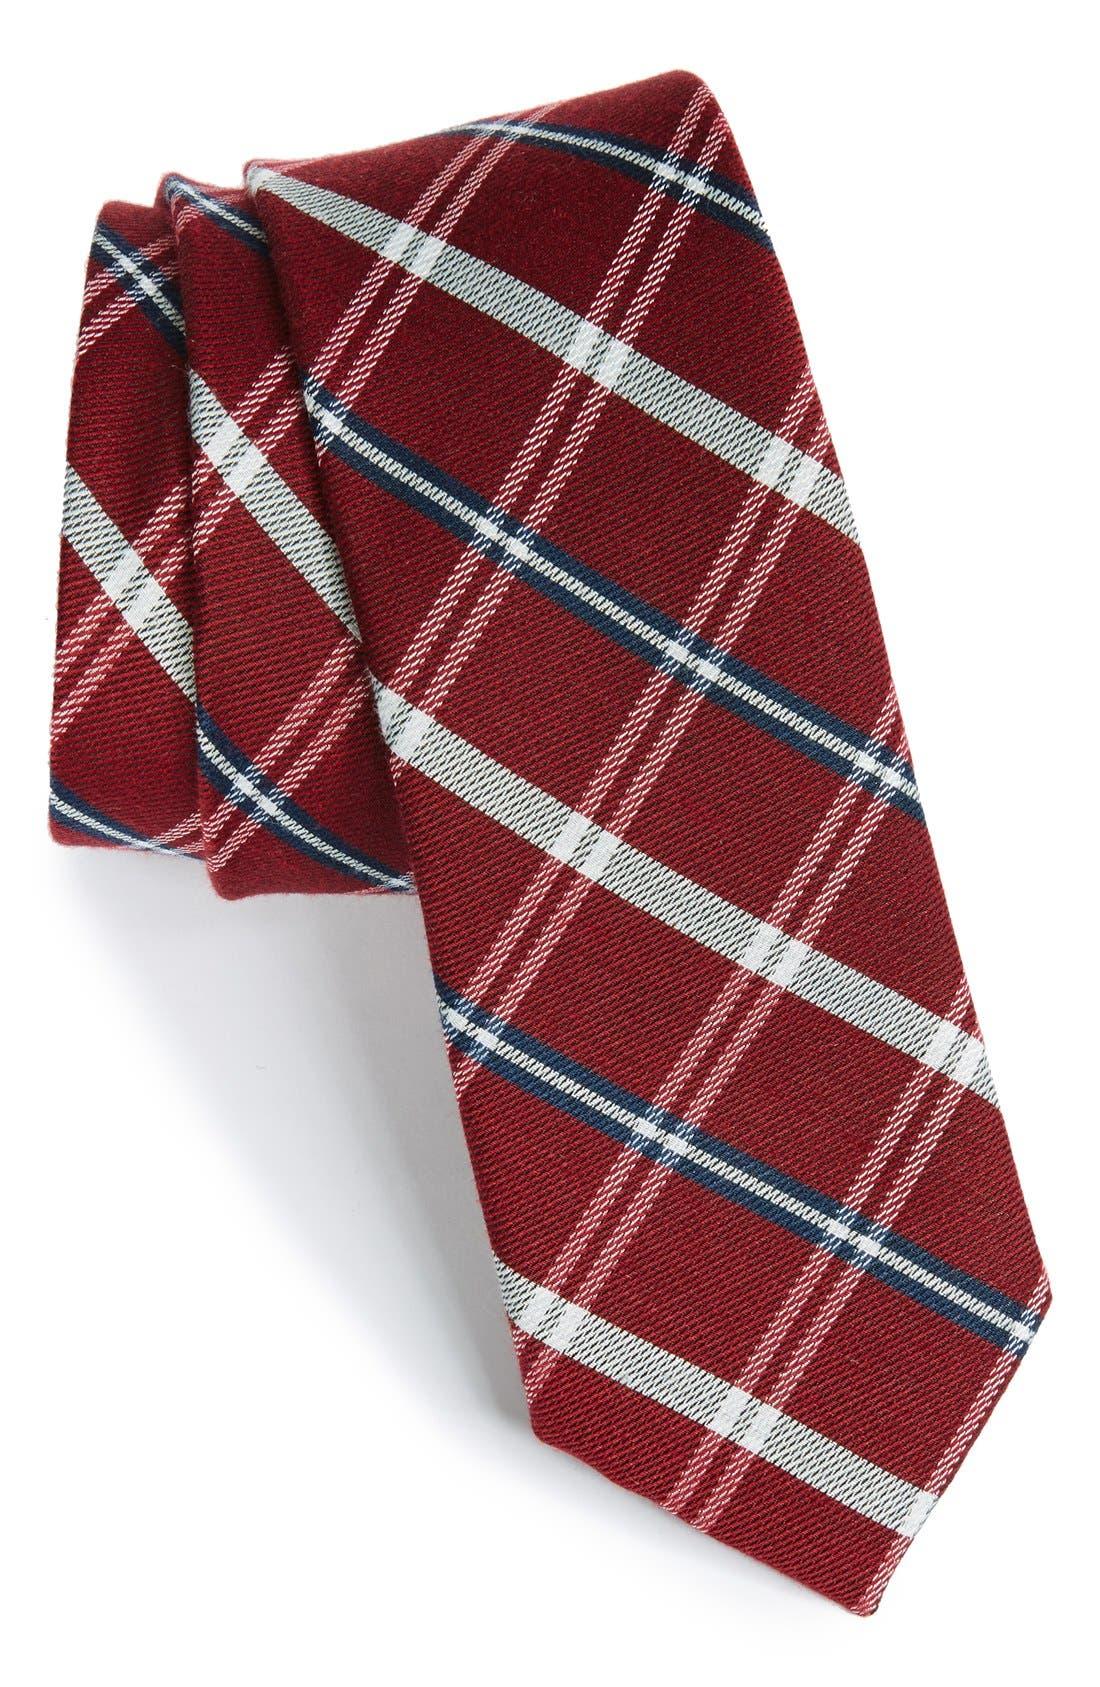 Alternate Image 1 Selected - 1901 'Logan' Plaid Tie